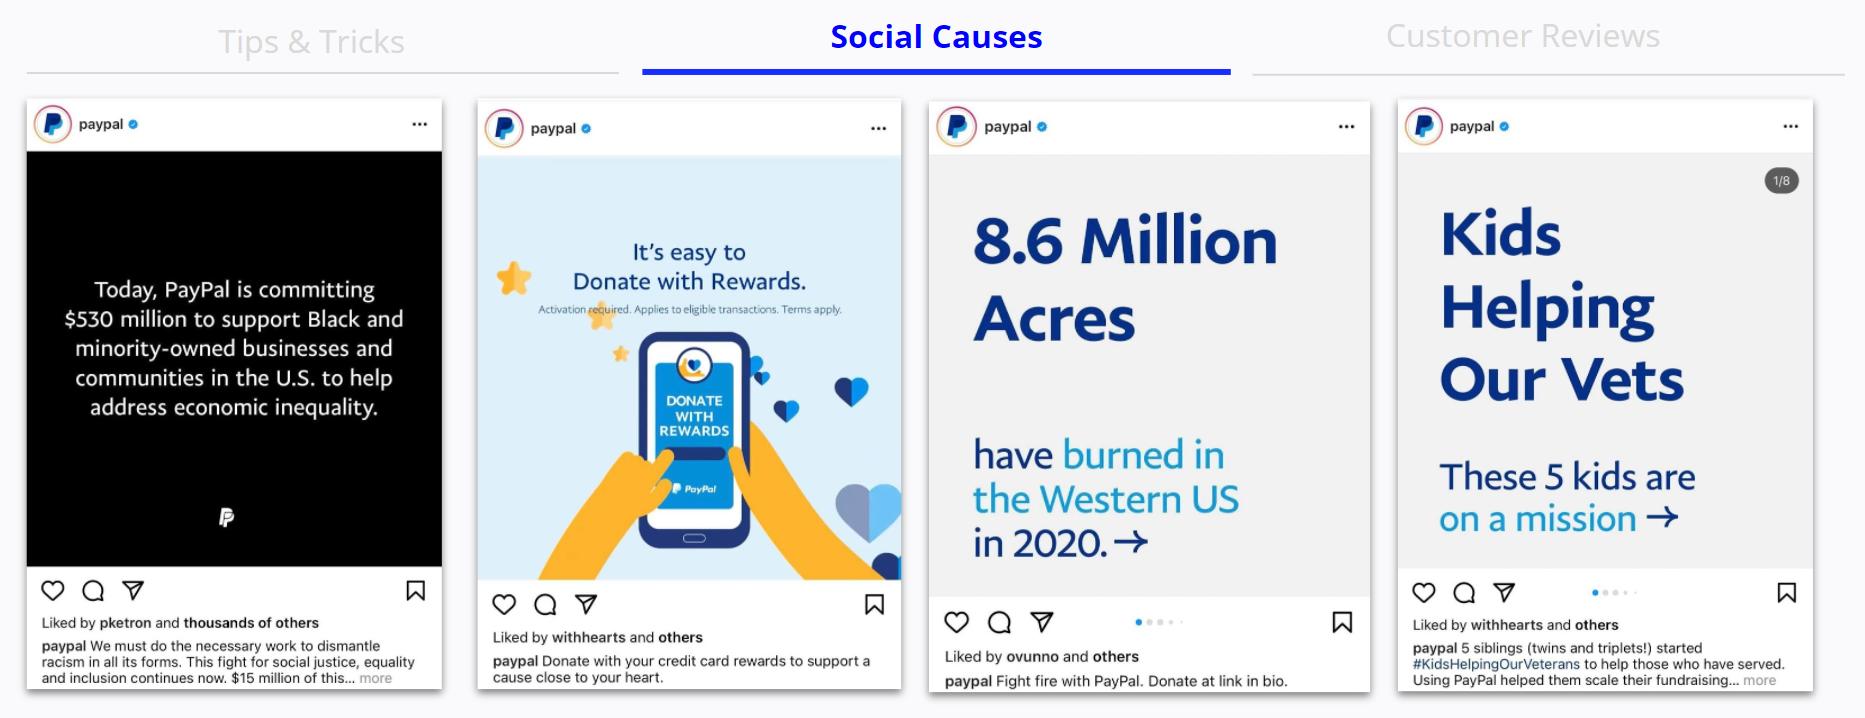 Paypal - Social Causes